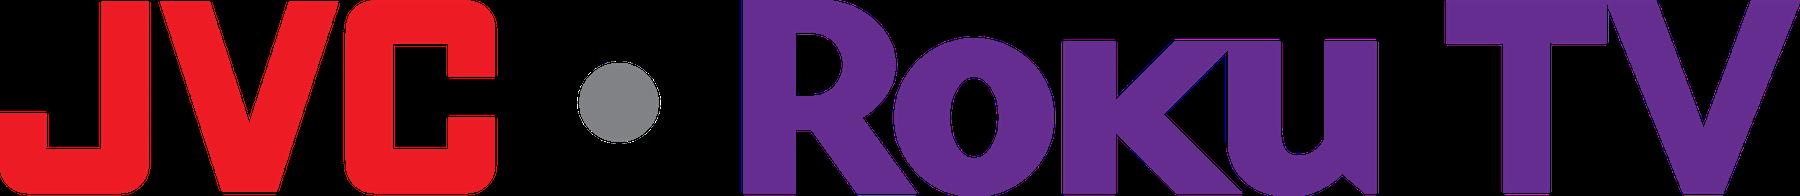 JVC Roku TV logo